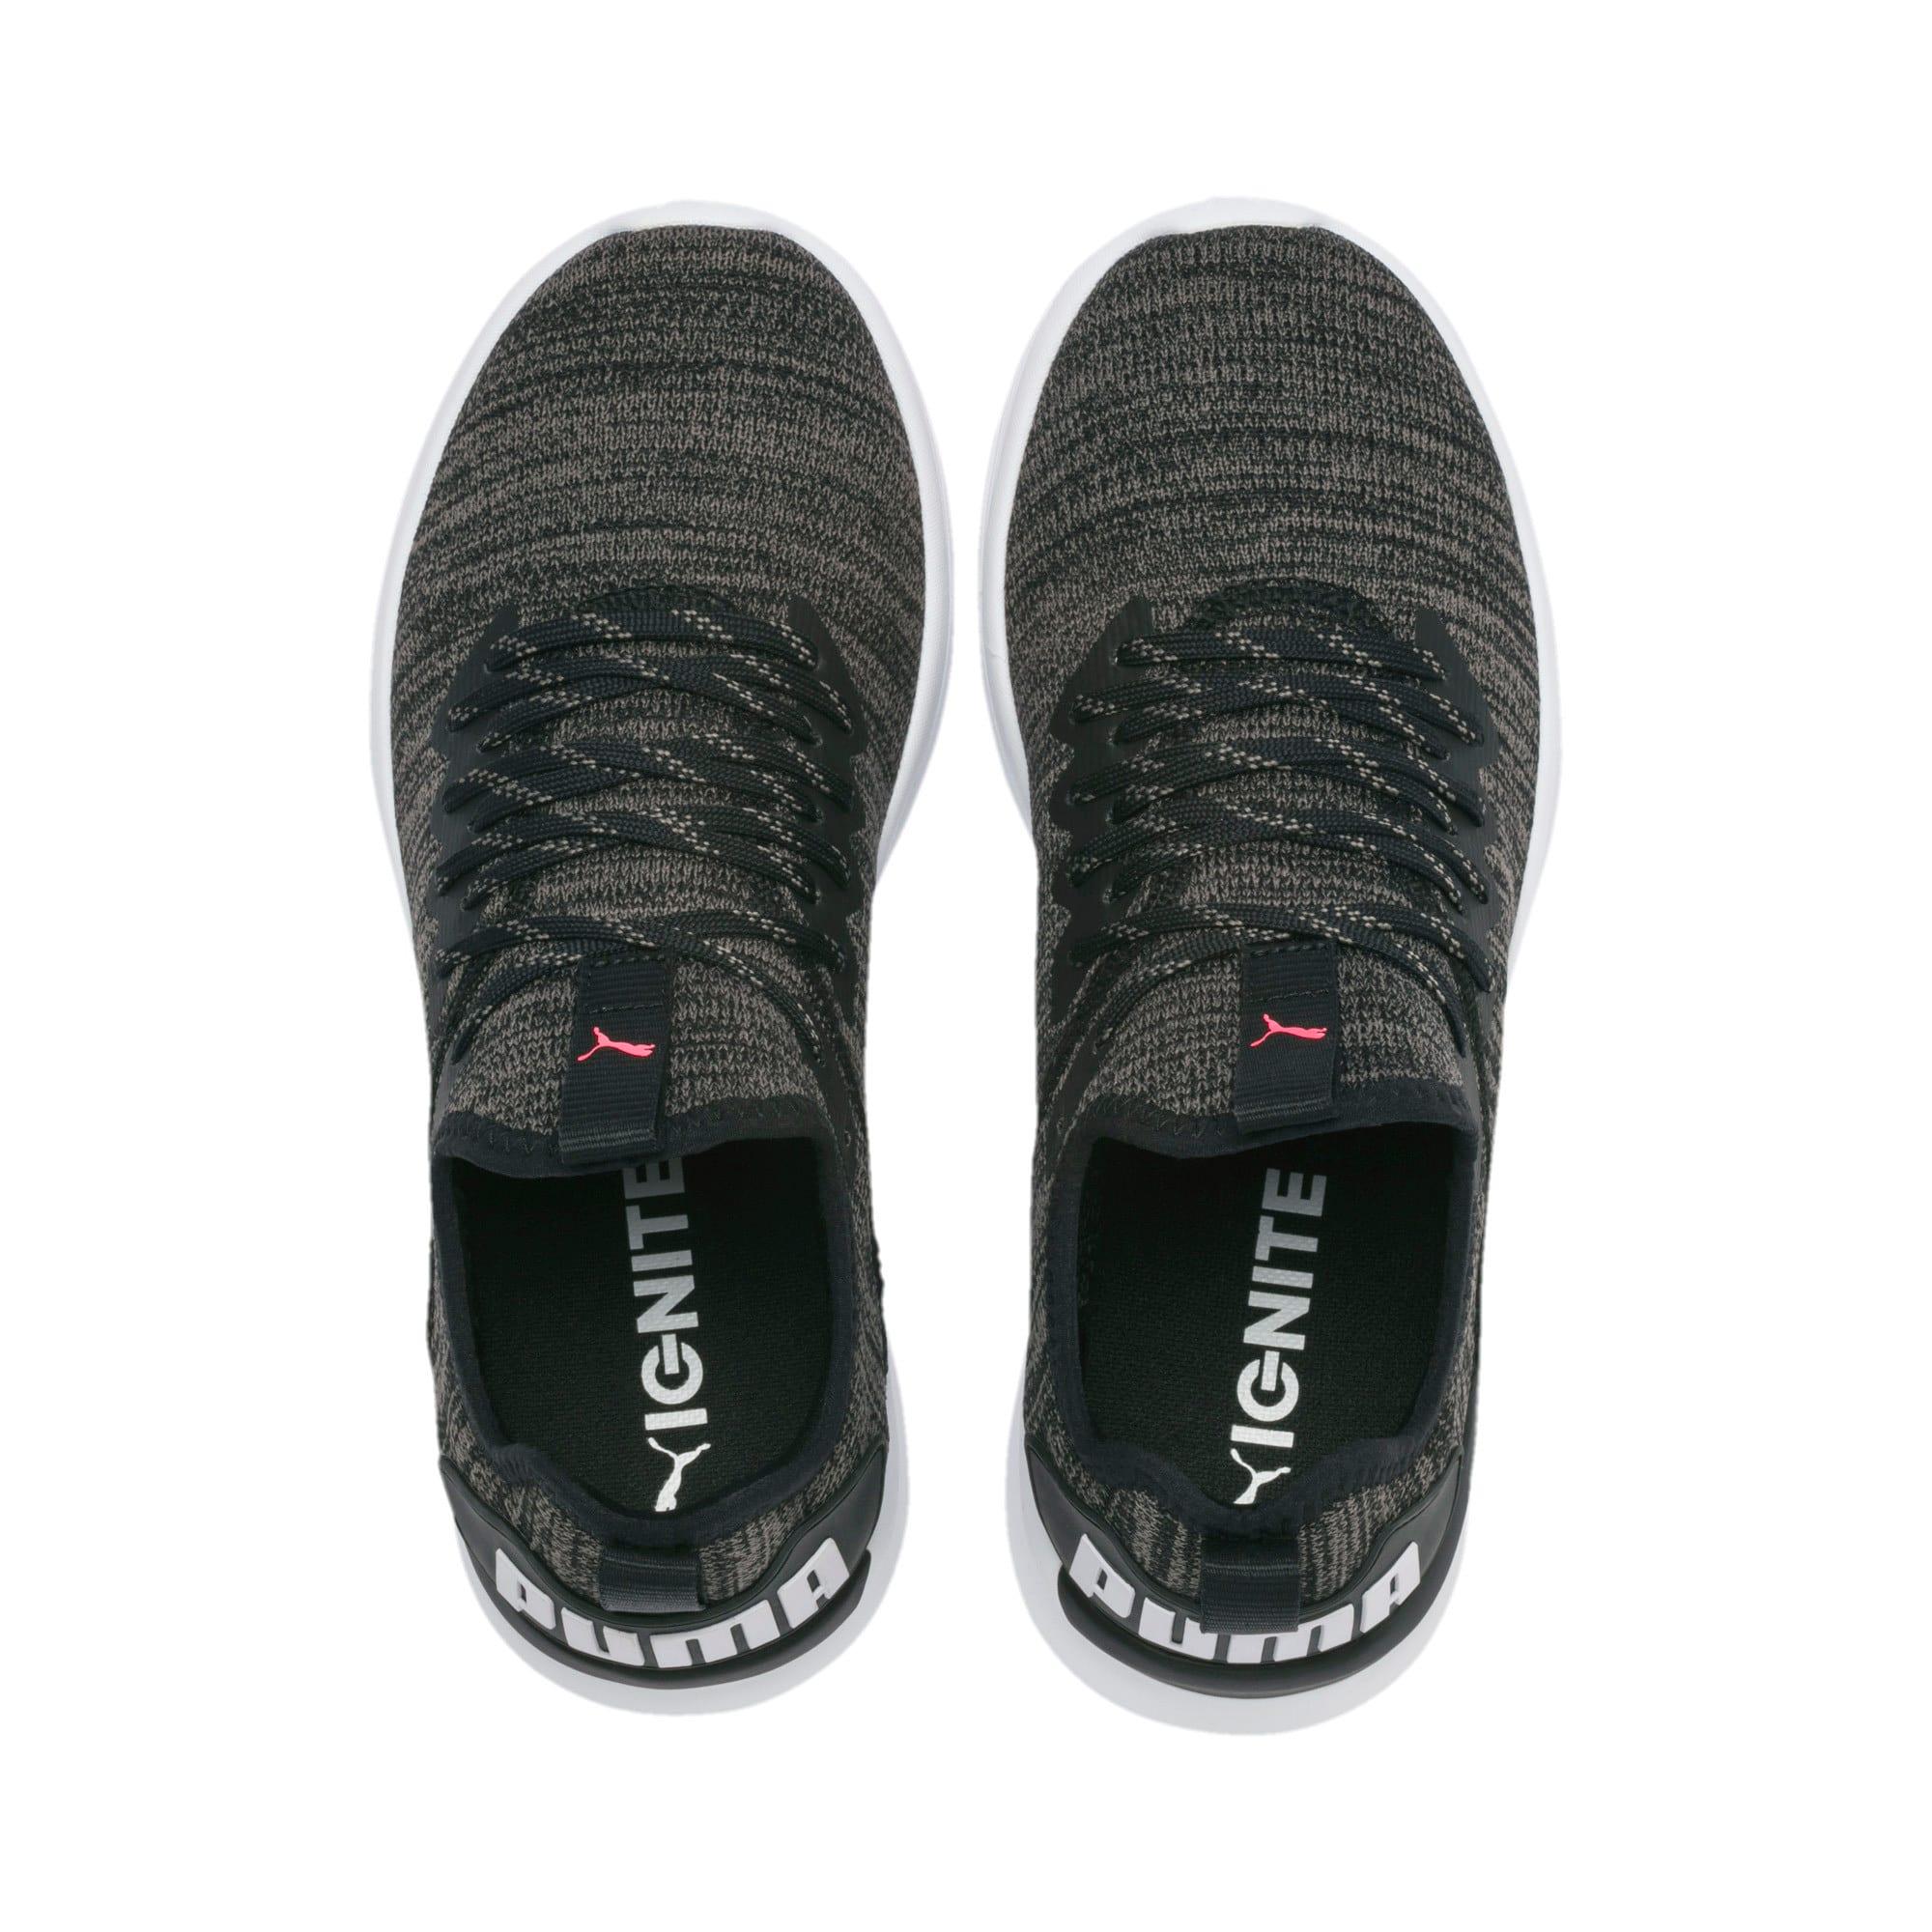 Thumbnail 7 of IGNITE Flash evoKNIT Women's Running Shoes, Black-White-Pink Alert, medium